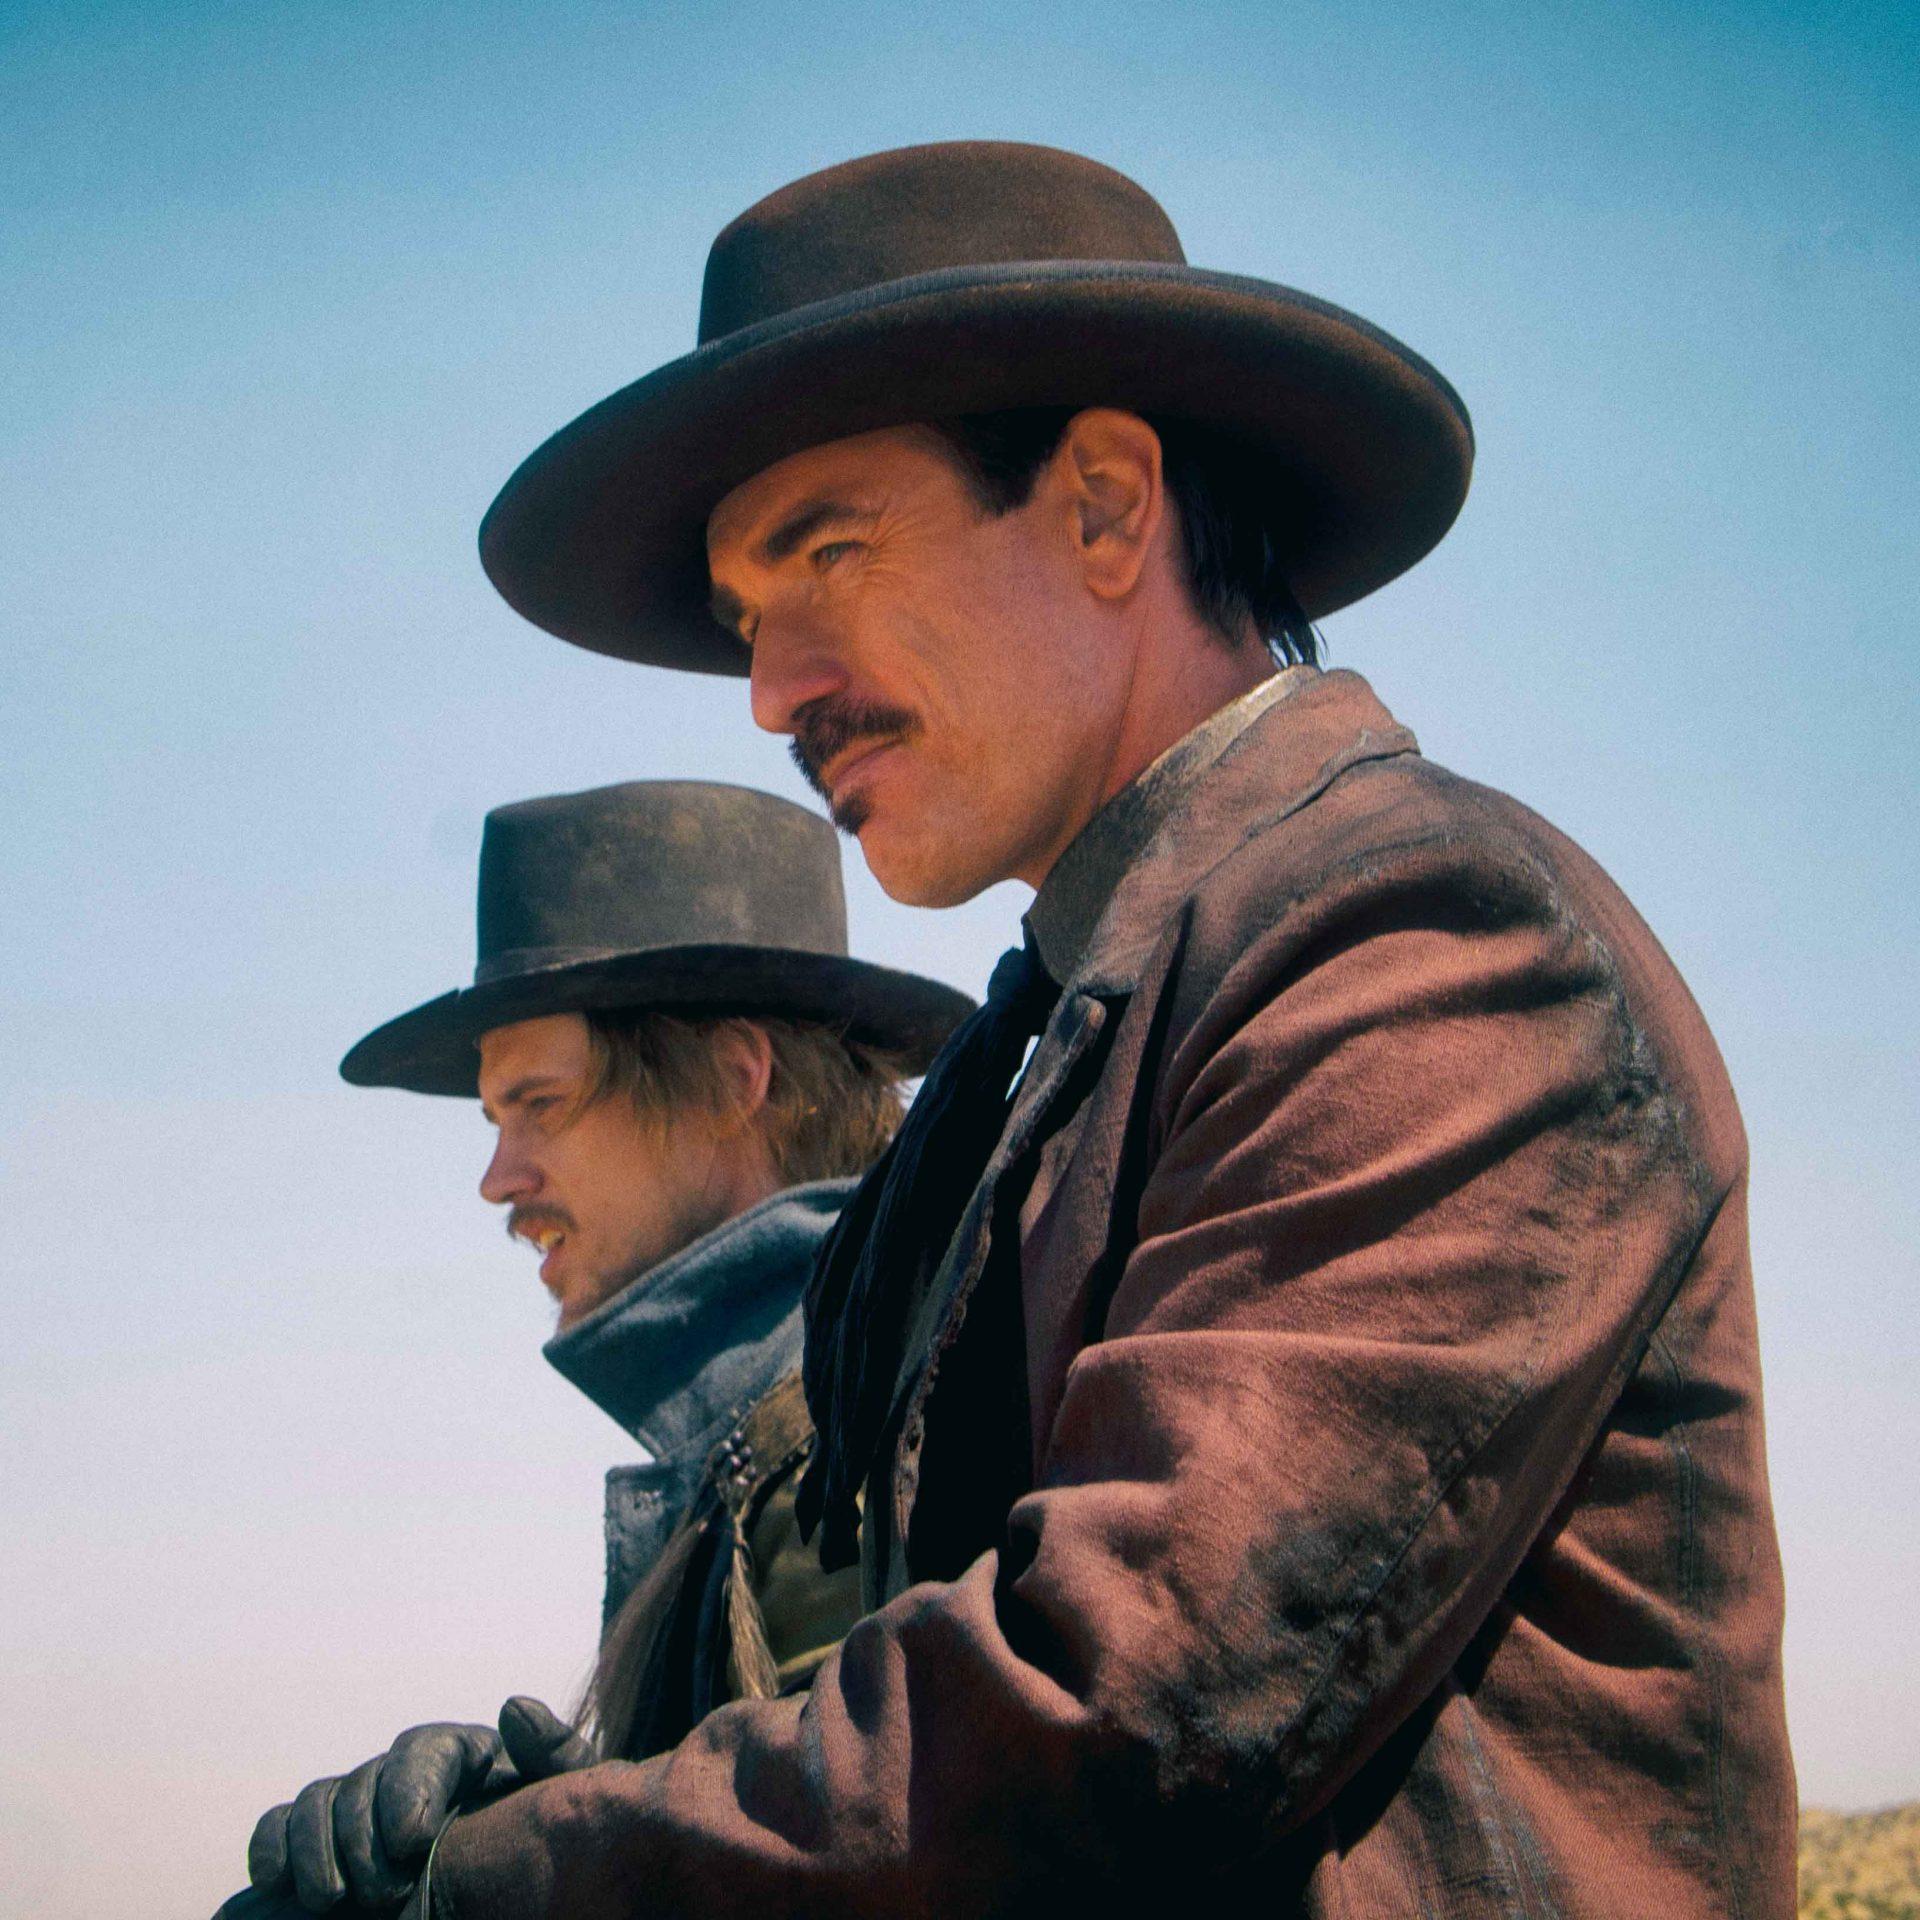 Ewan McGregor in Jane Got a Gun